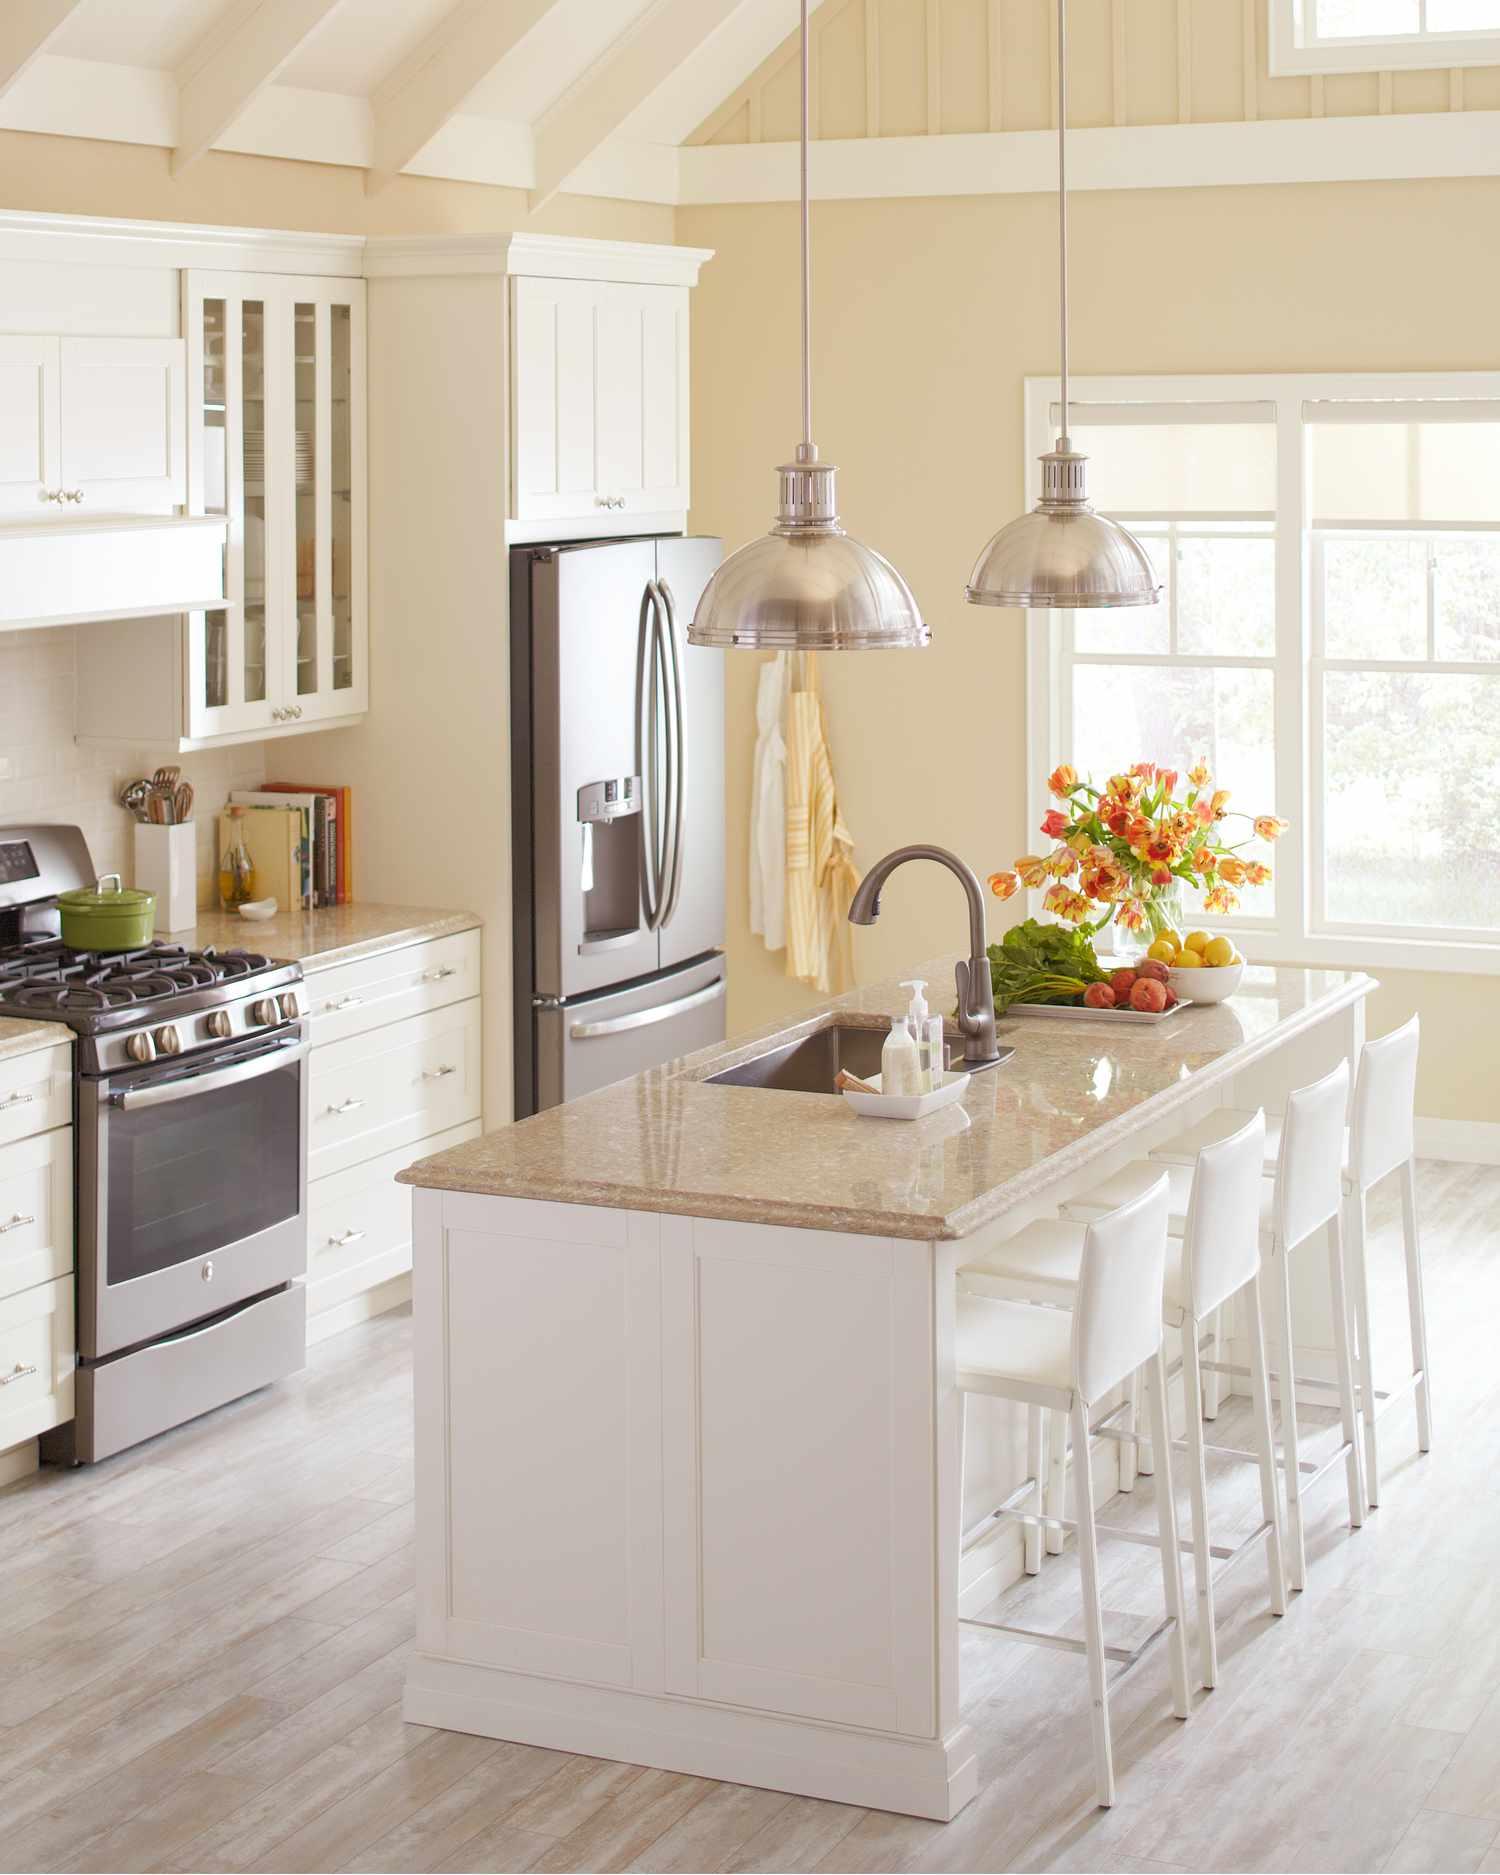 quartz and corian countertops